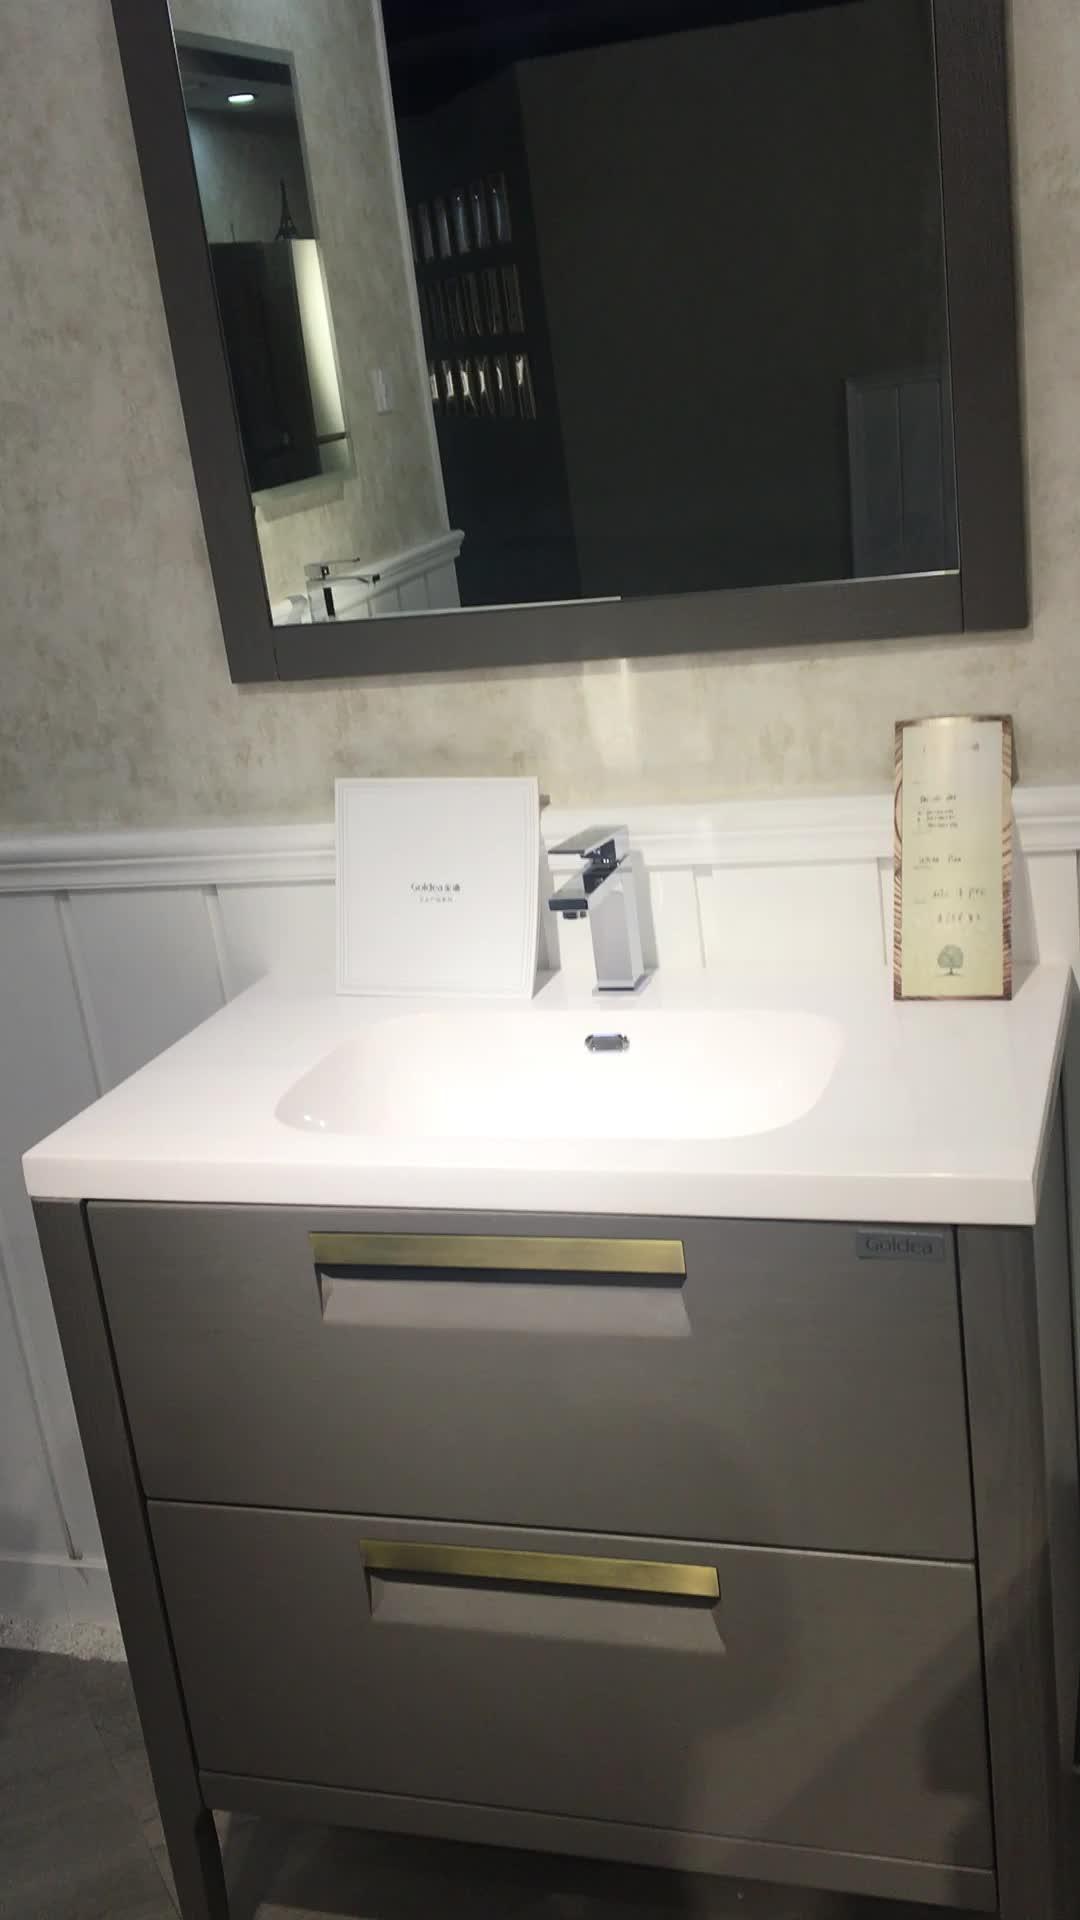 Goldea 72 Inch Bathroom Vanity / Custom Bathroom Vanity / Solid Wood ...